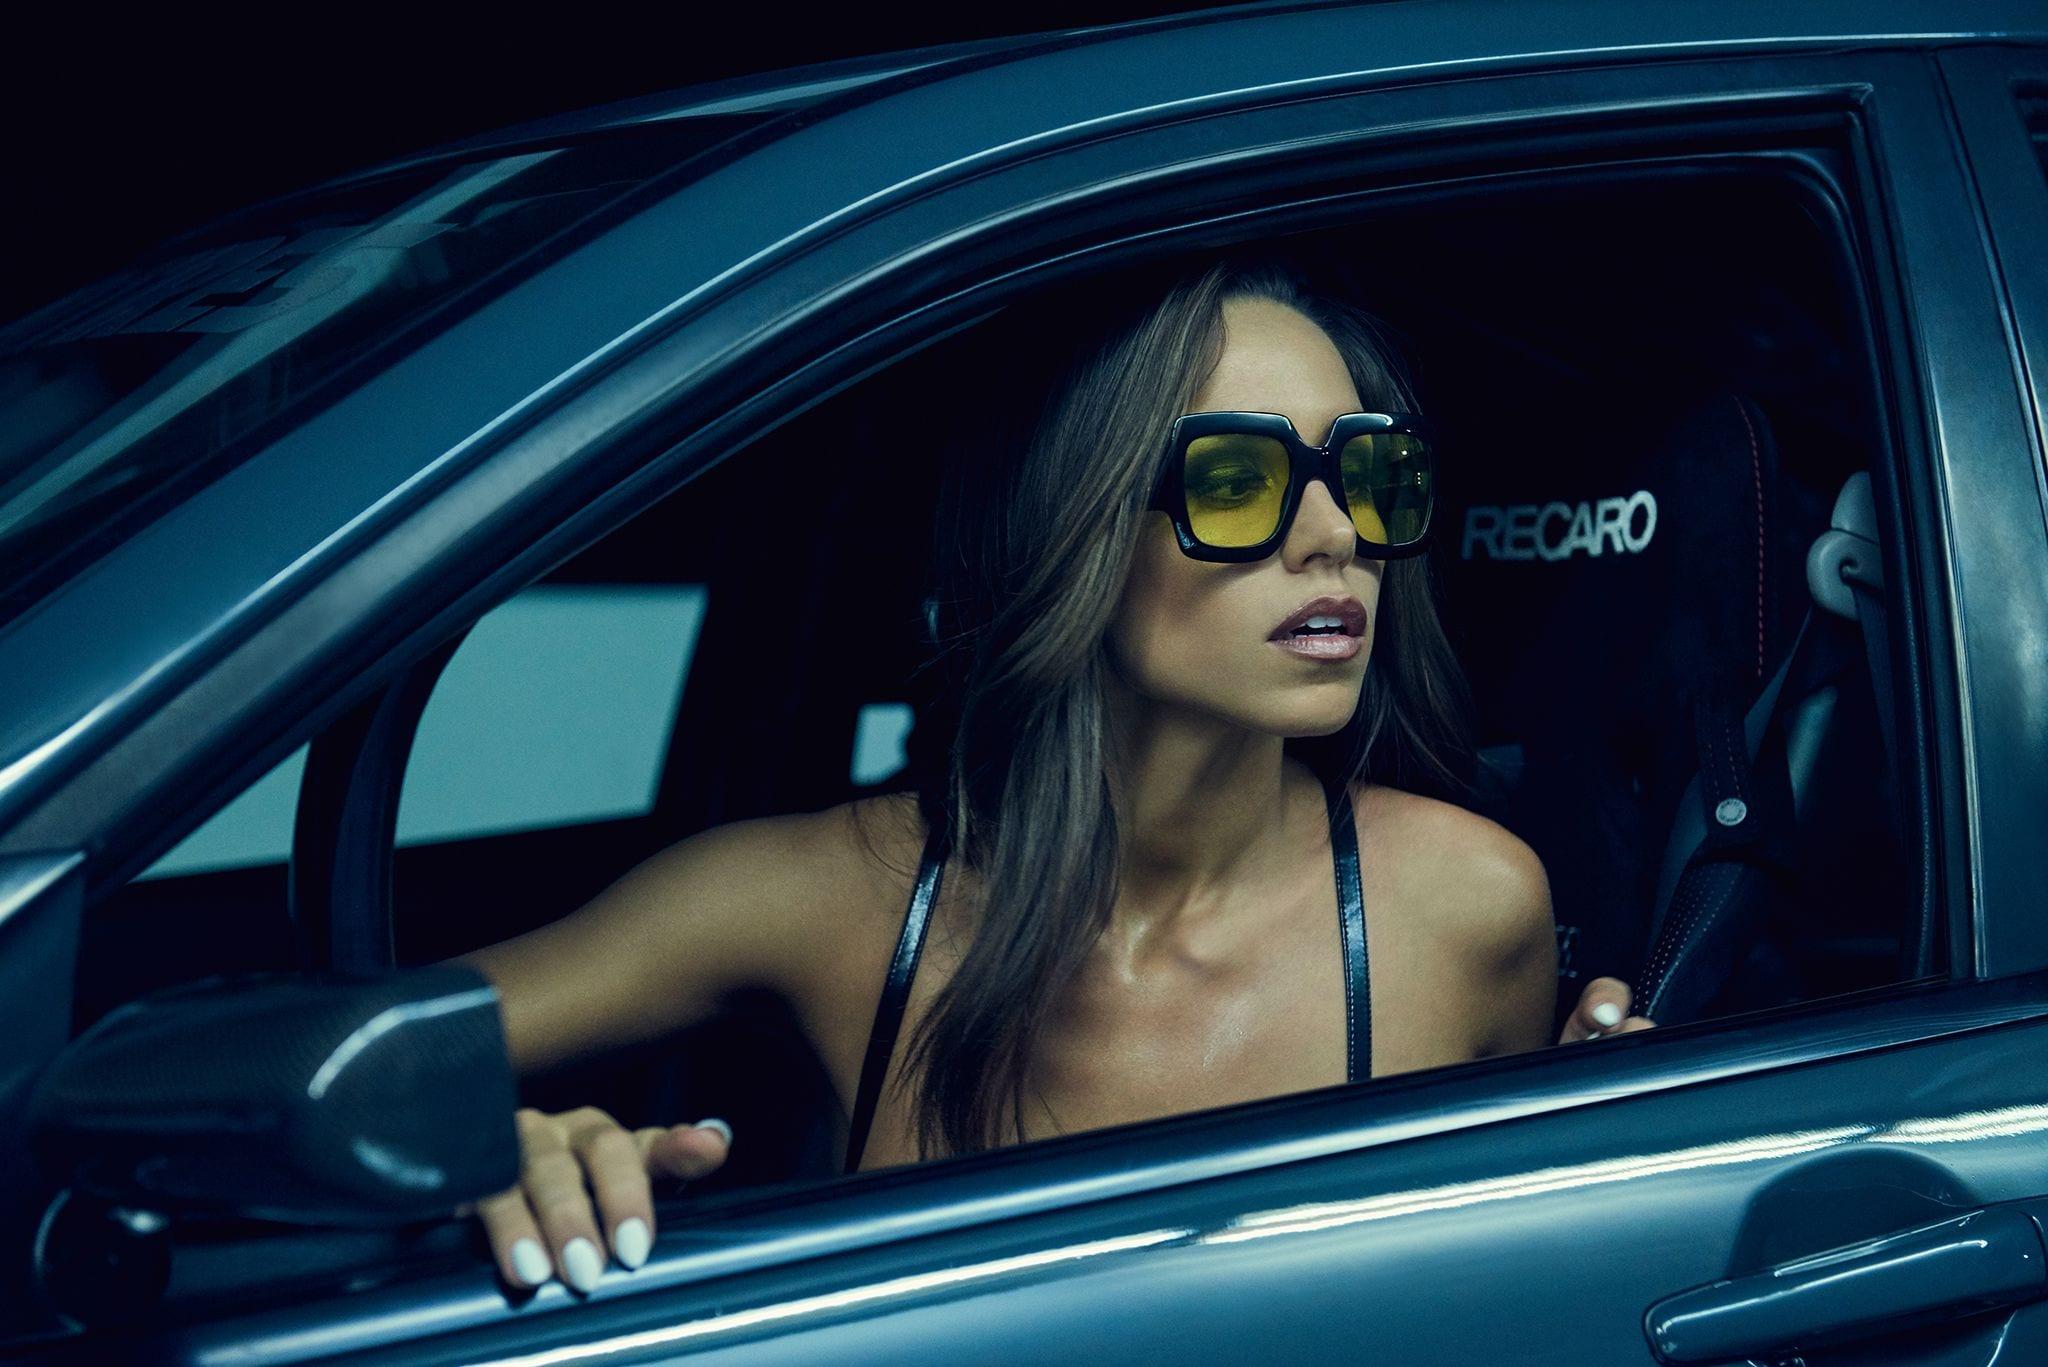 Photo of Model Kyra Keli wearing black glasses sitting in a grey car.